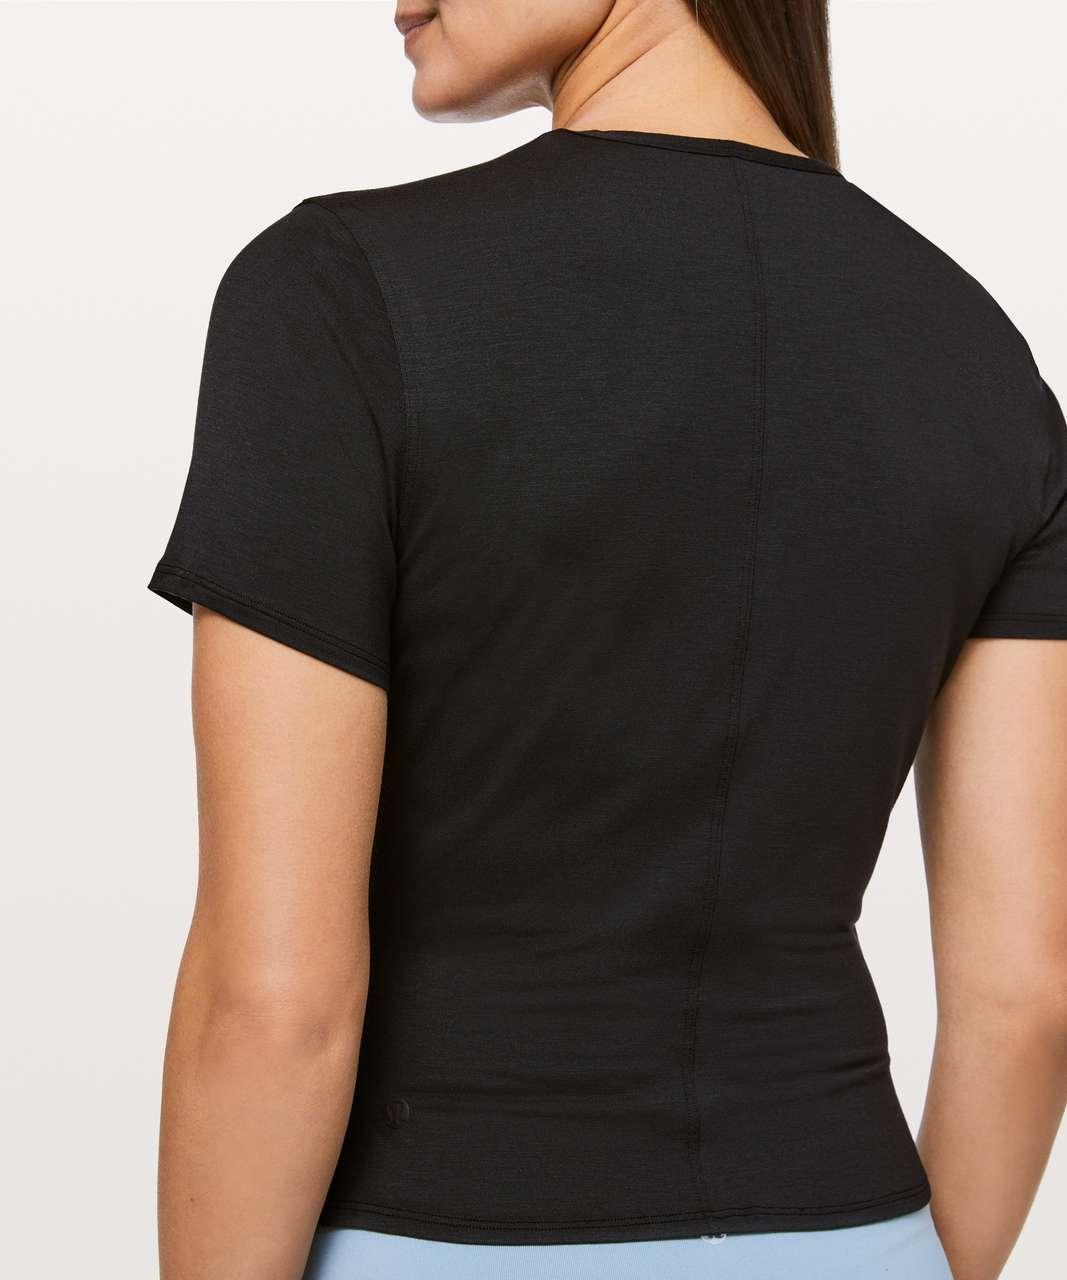 Lululemon Round Trip Short Sleeve - Black